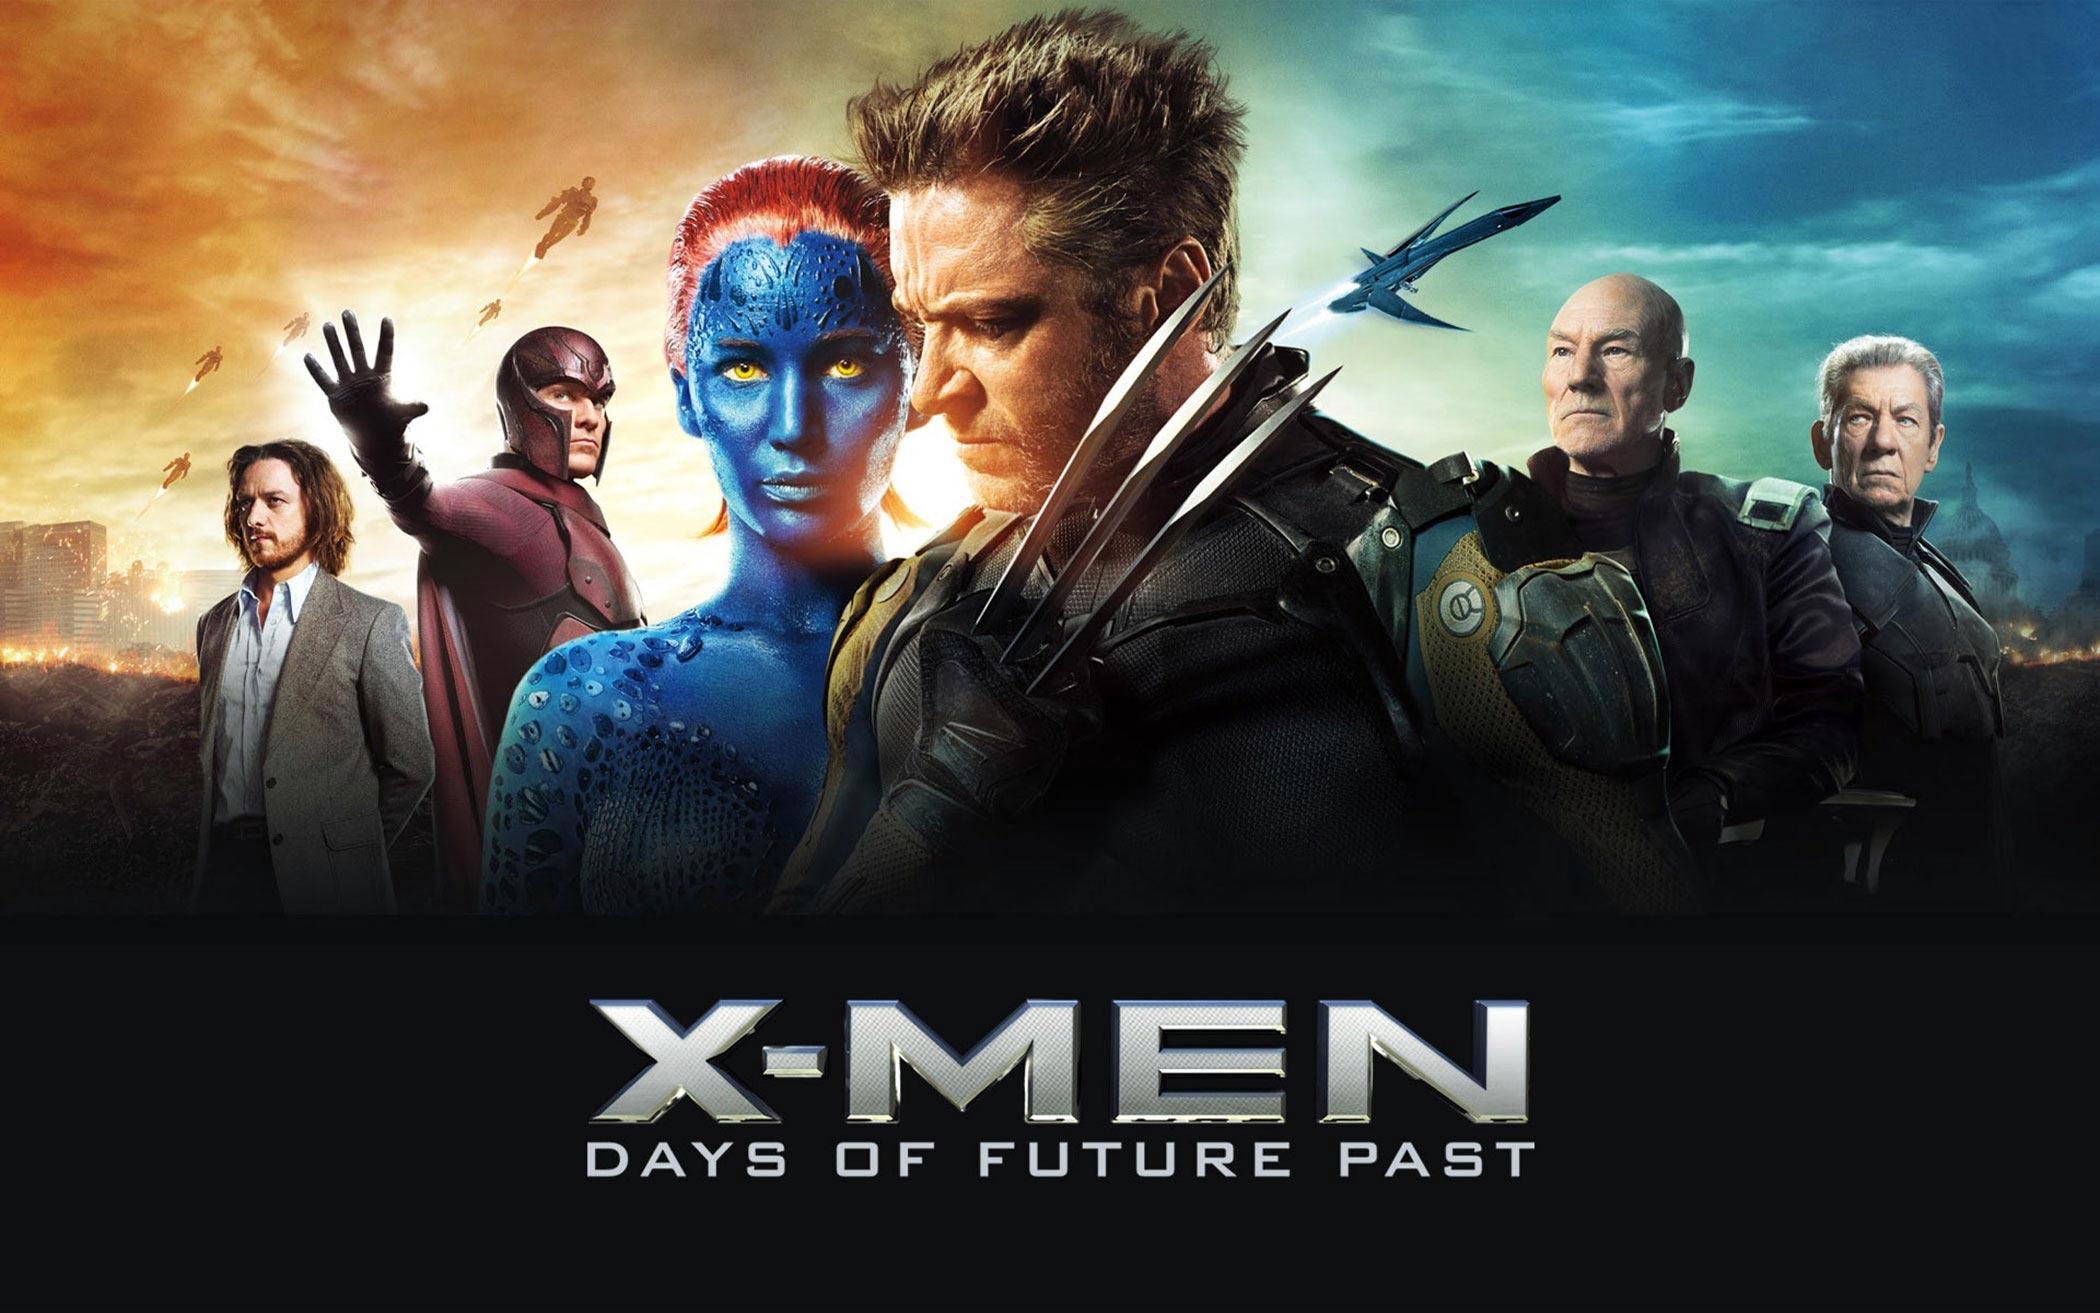 84] X Men Days Of Future Past Wallpapers on WallpaperSafari 2100x1313